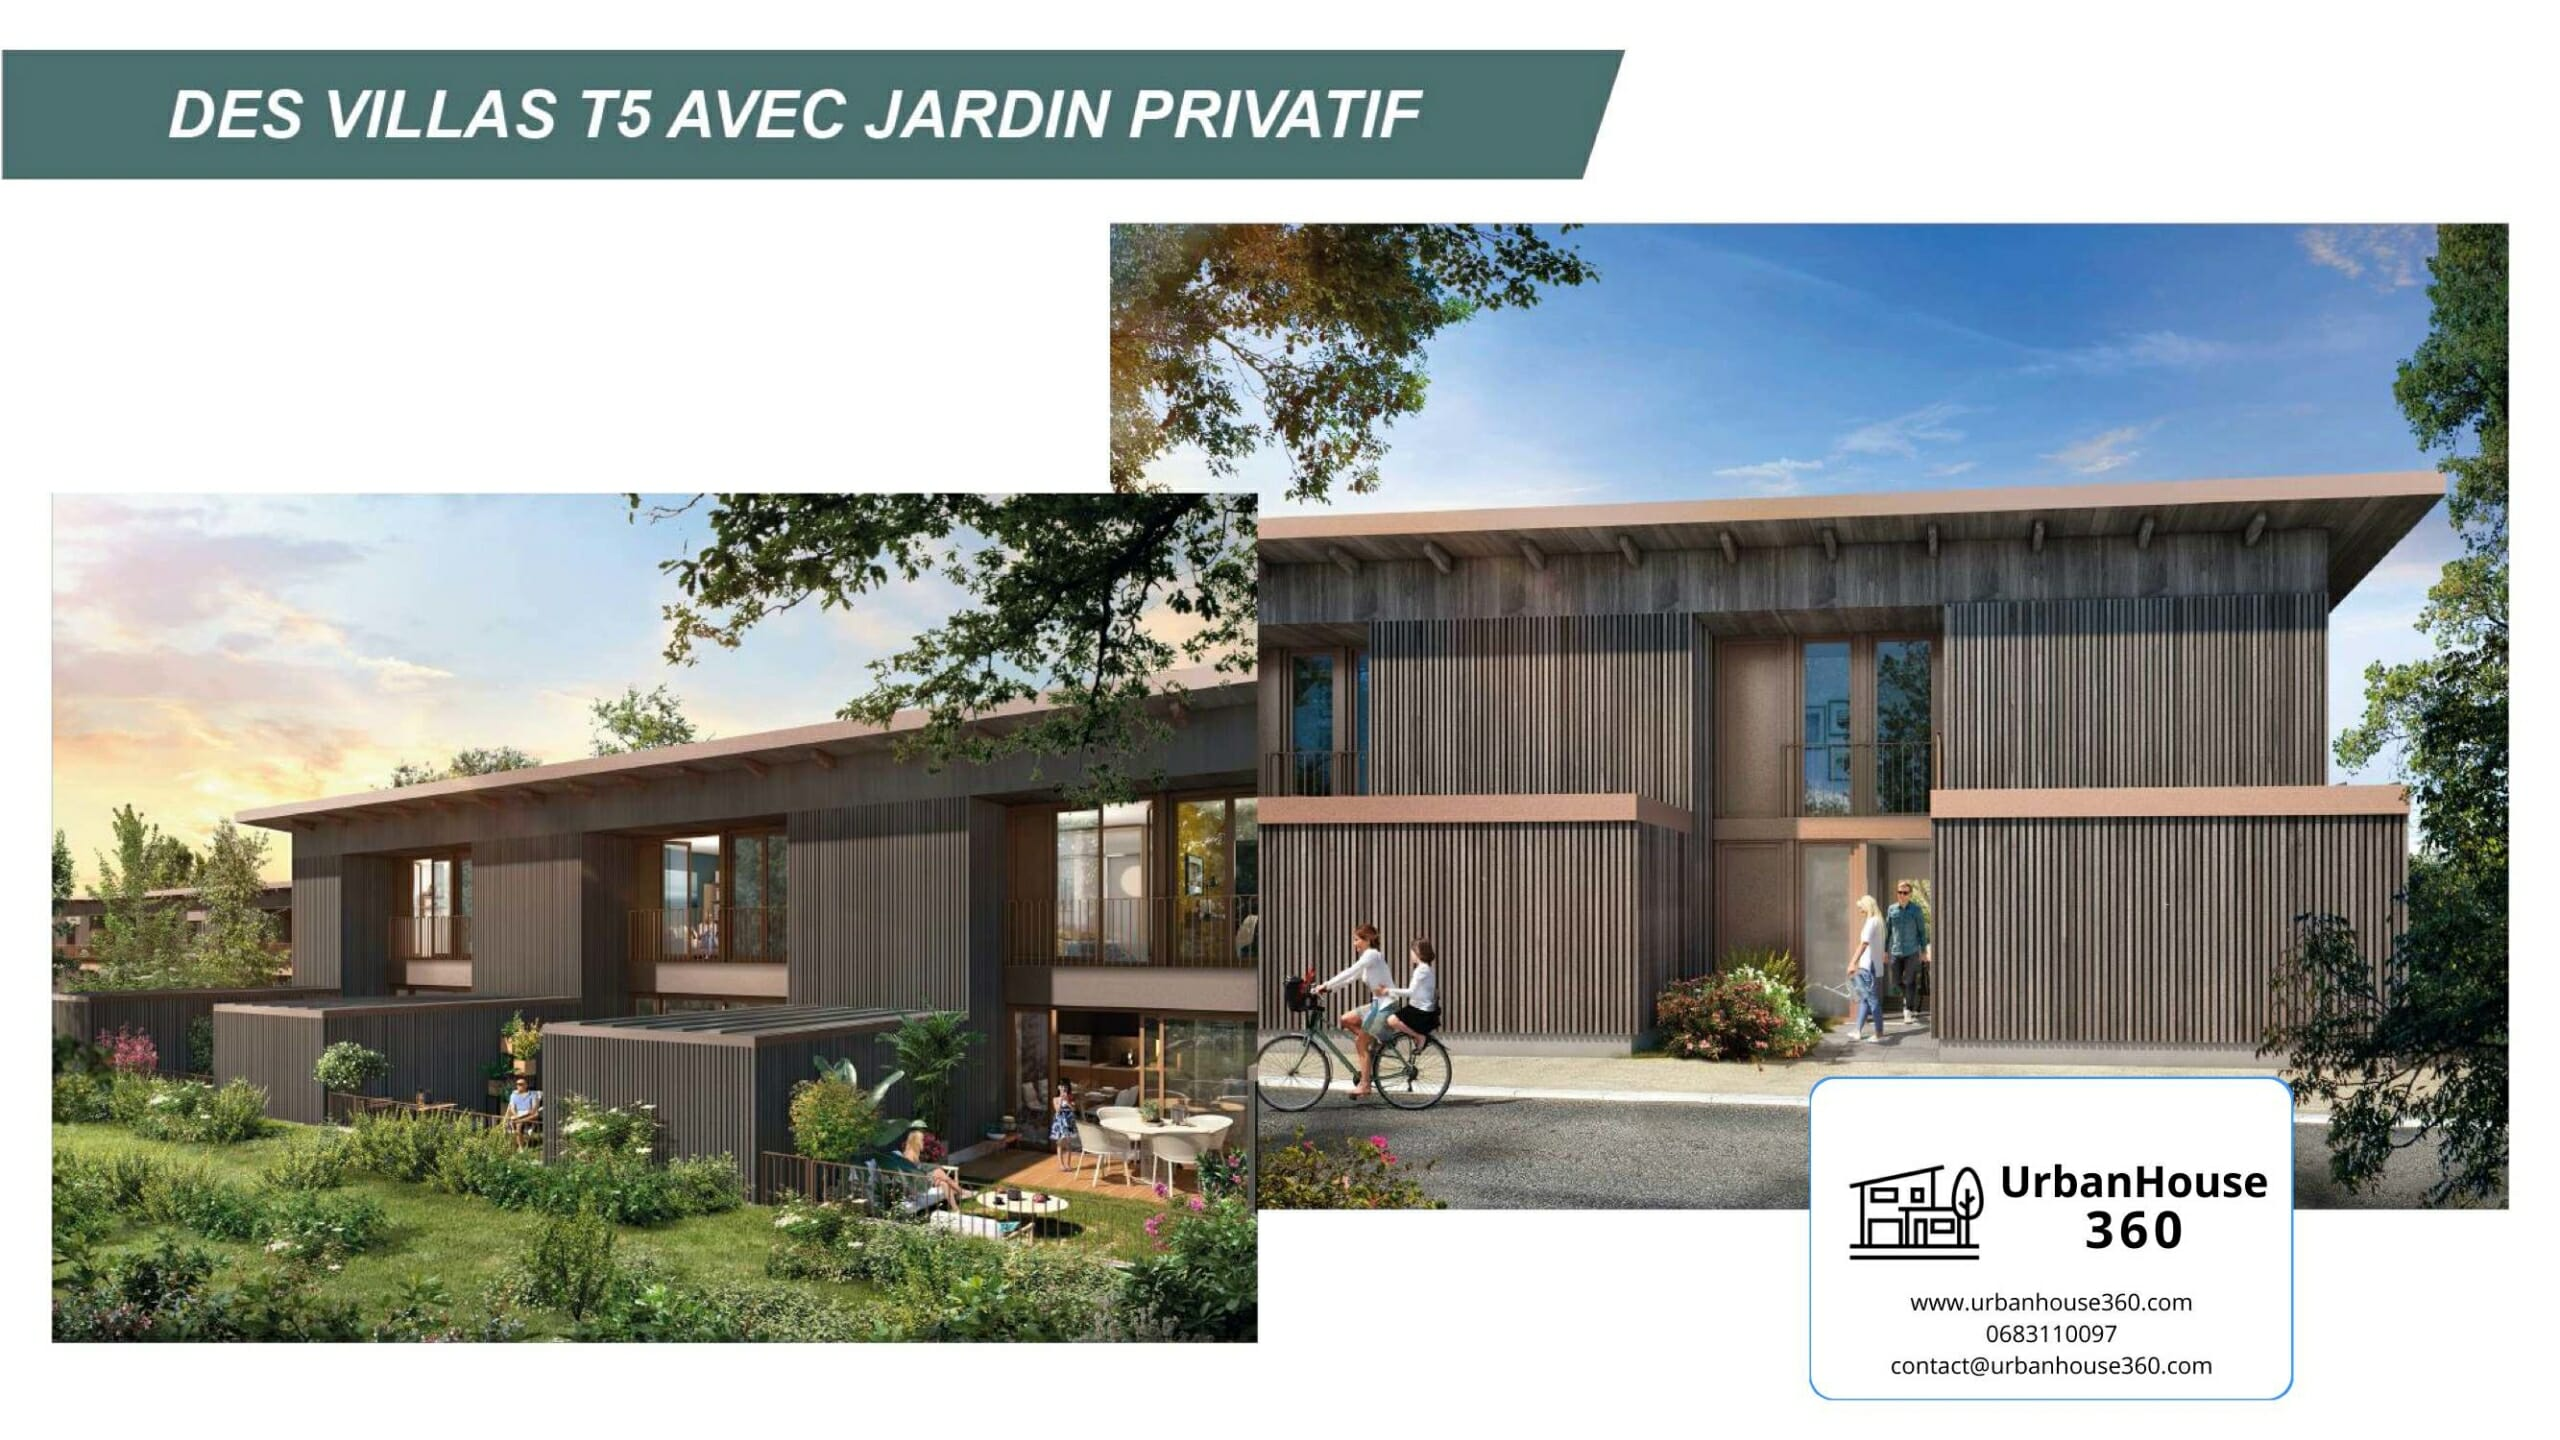 Carre-Flore-Présentation-Cornebarrieu-Urbanhouse360